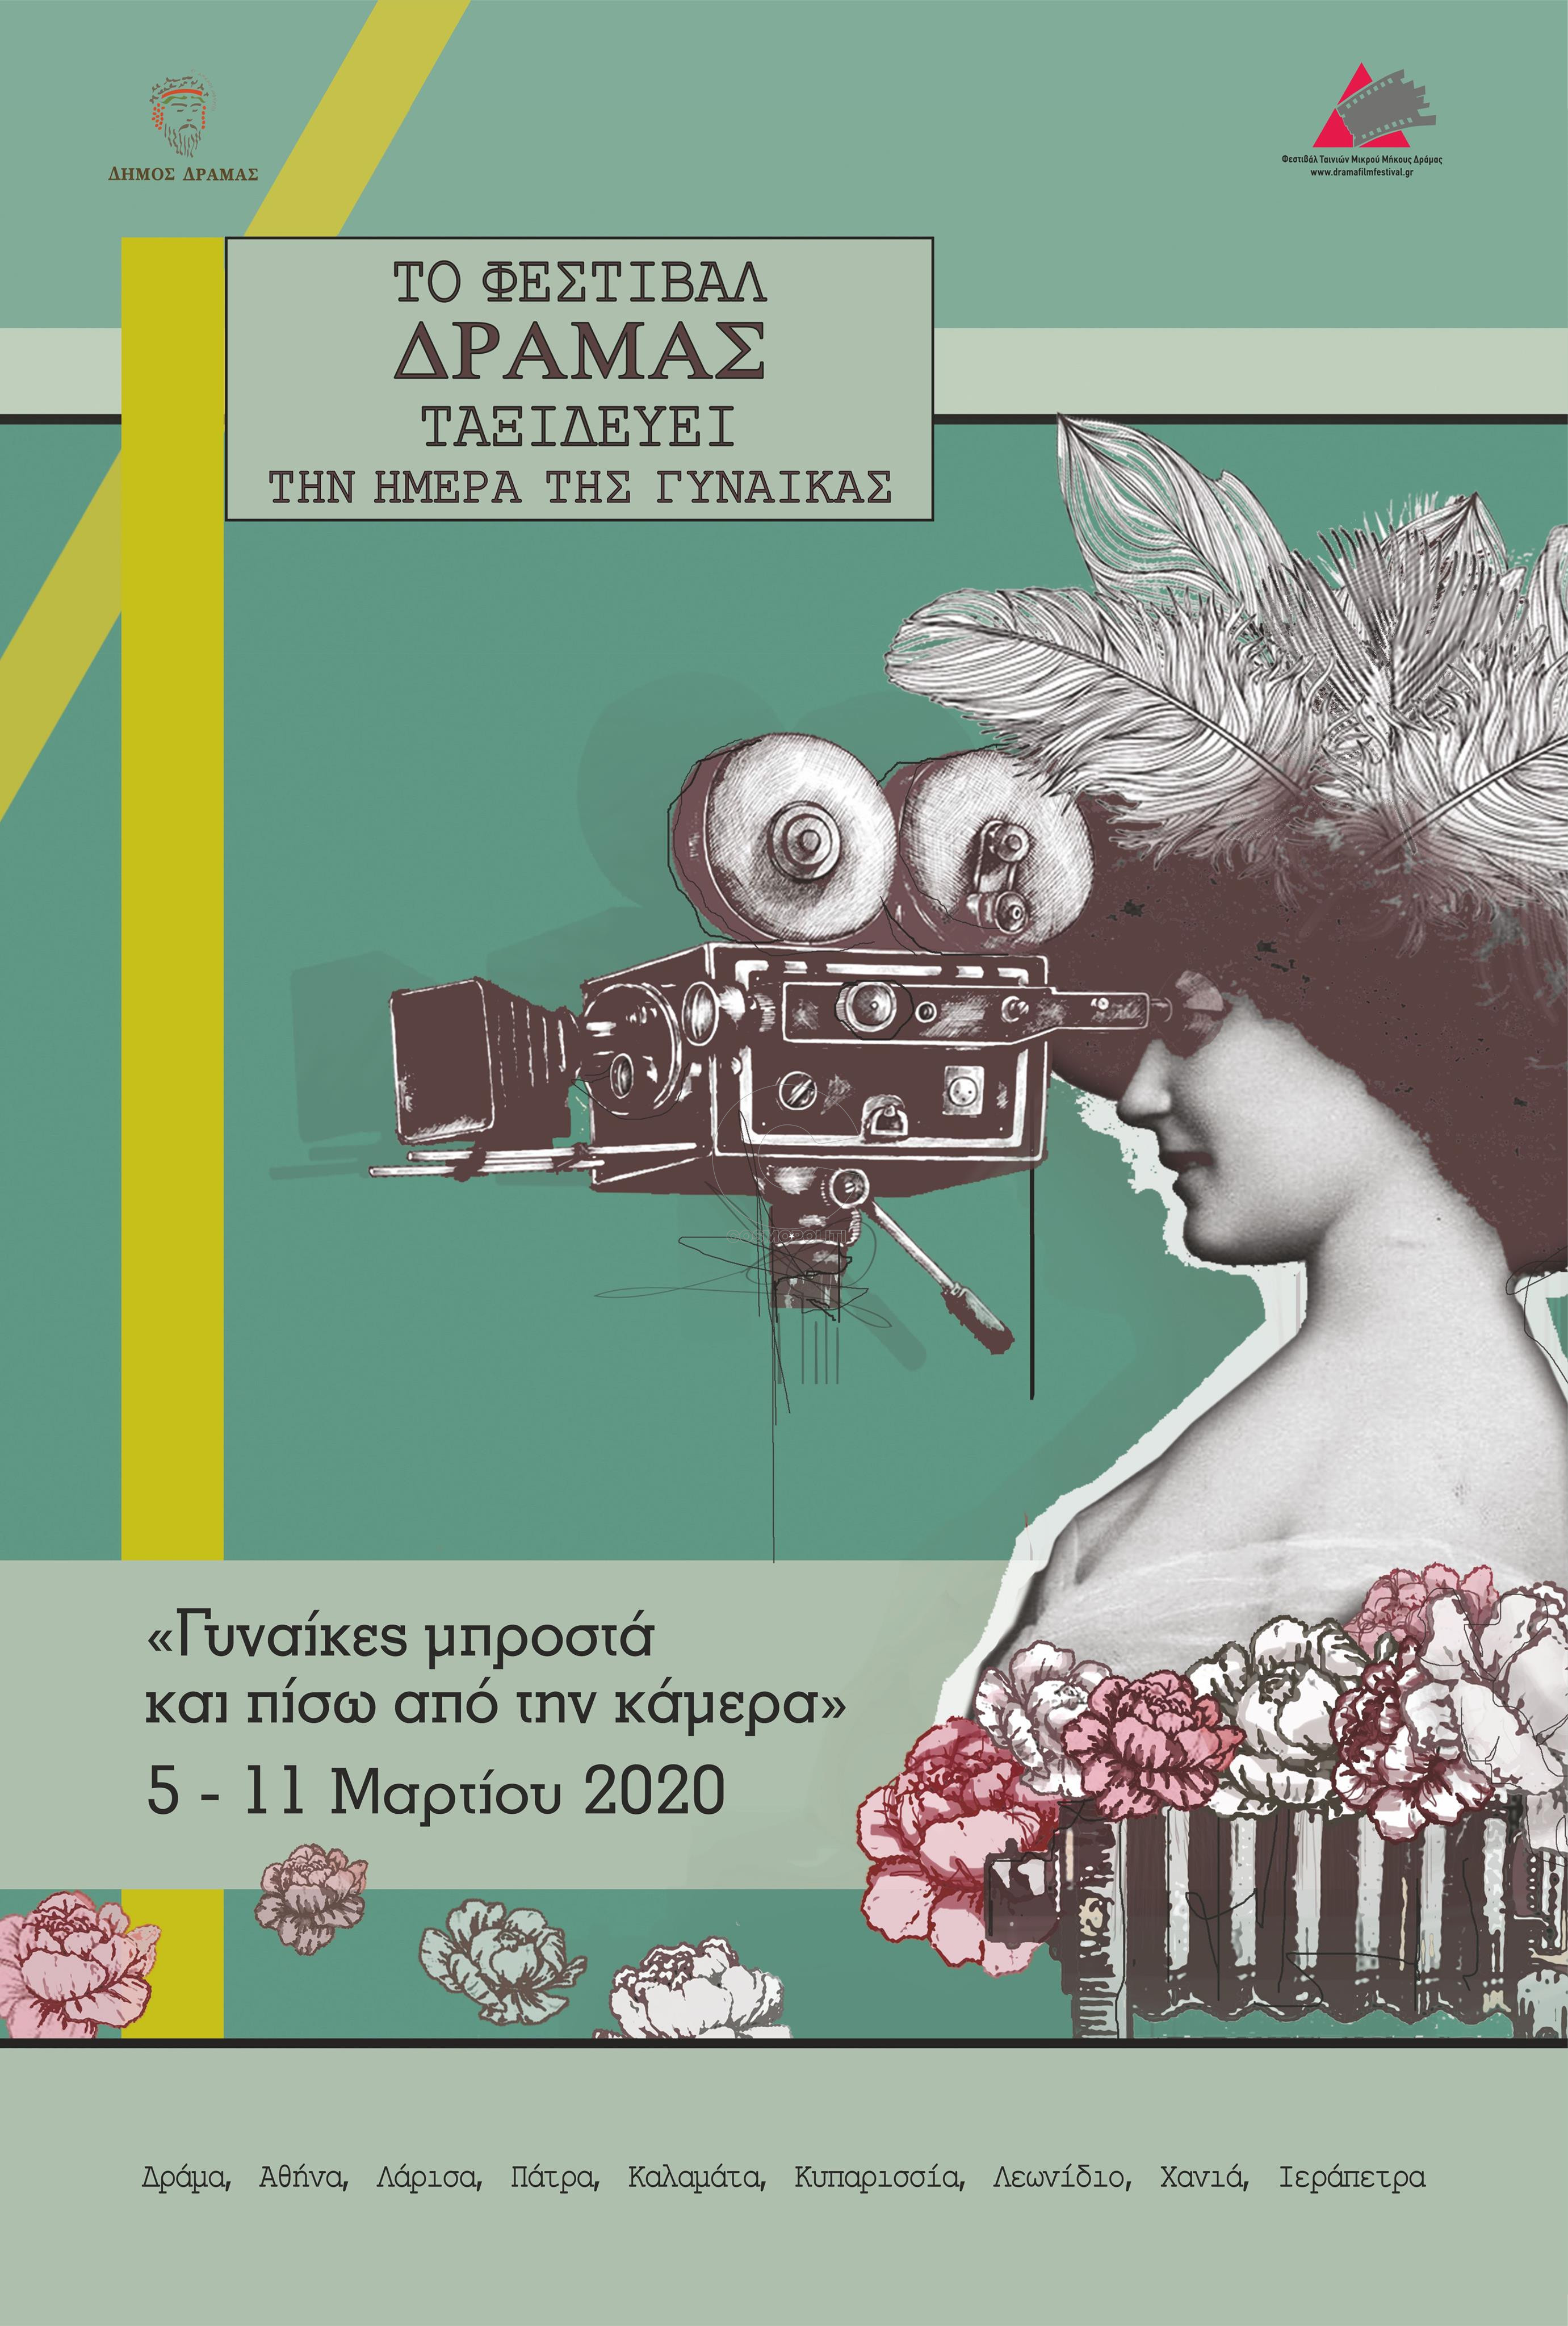 Poster ΗΜΕΡΑ ΓΥΝΑΙΚΑΣ 9 πλεις